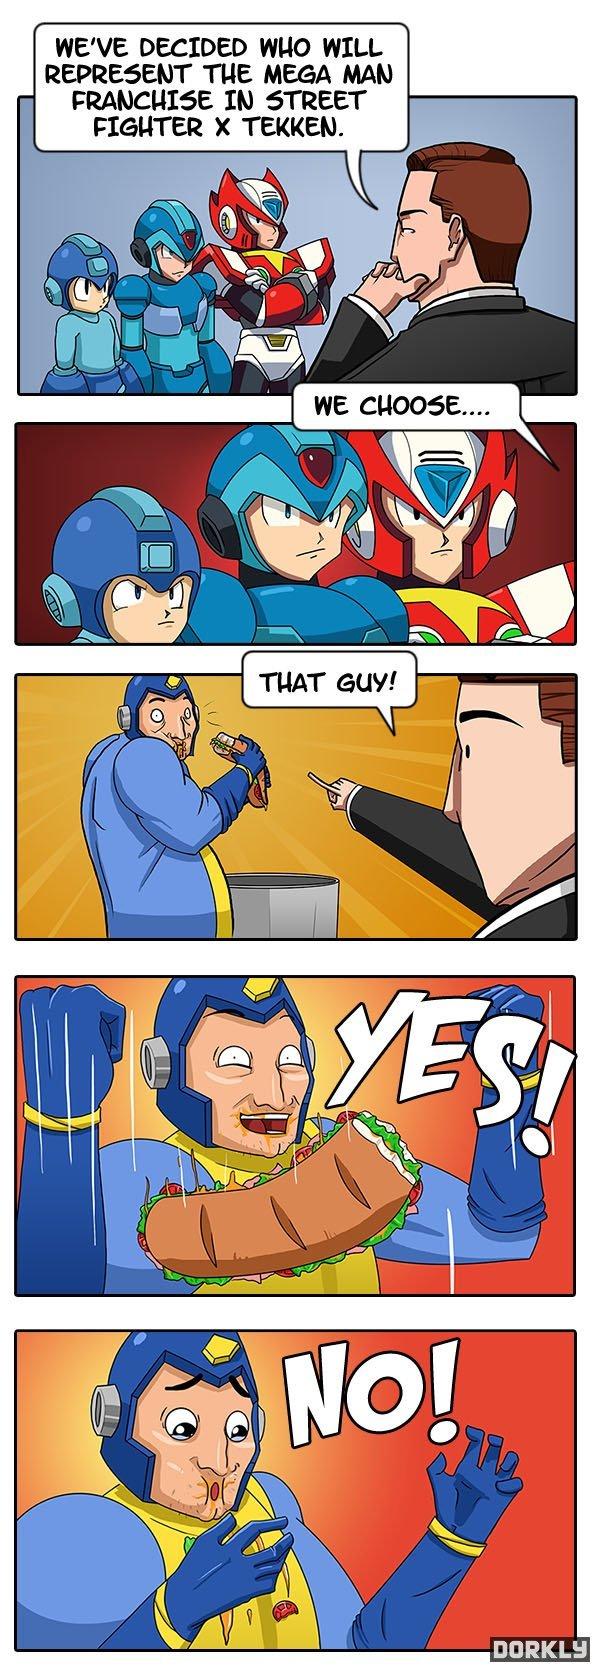 The Right Mega Man. He's so old creds to Dorkly.com.. I want megaman legends 3, horse cunts capcom is. Megaman street fighter X fatass